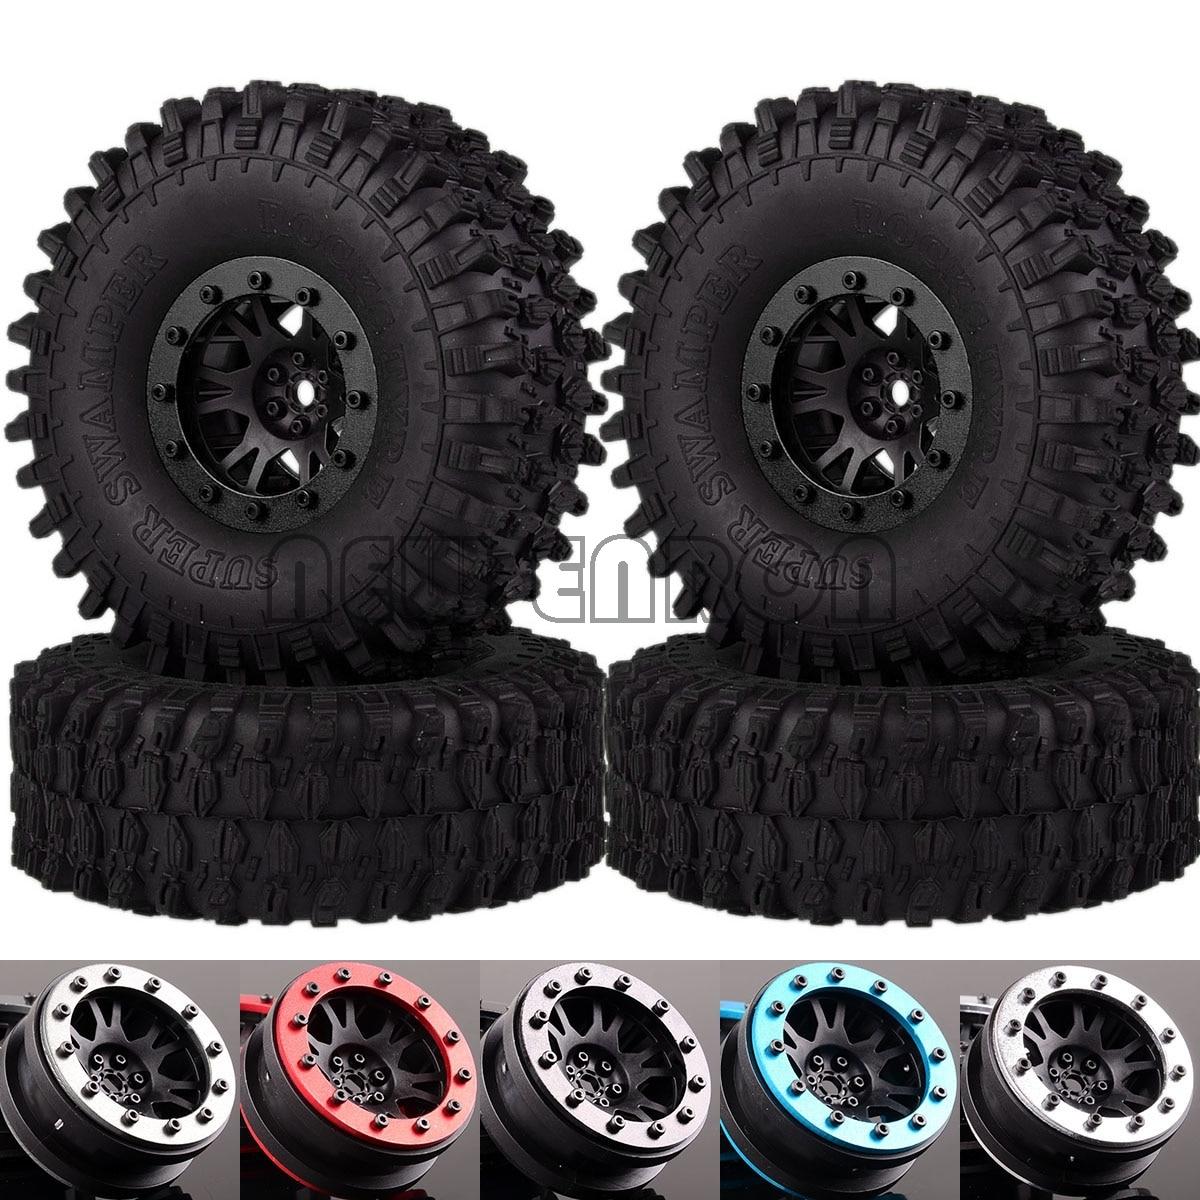 "NEW ENRON 4P 1.9"" Metal Beadlock Wheel Rim 120MM Tires Tyre For RC 1/10 Crawler 90047 D110 TF2 TRX4 Tamiya CC01 TF2 D90 D110(China)"